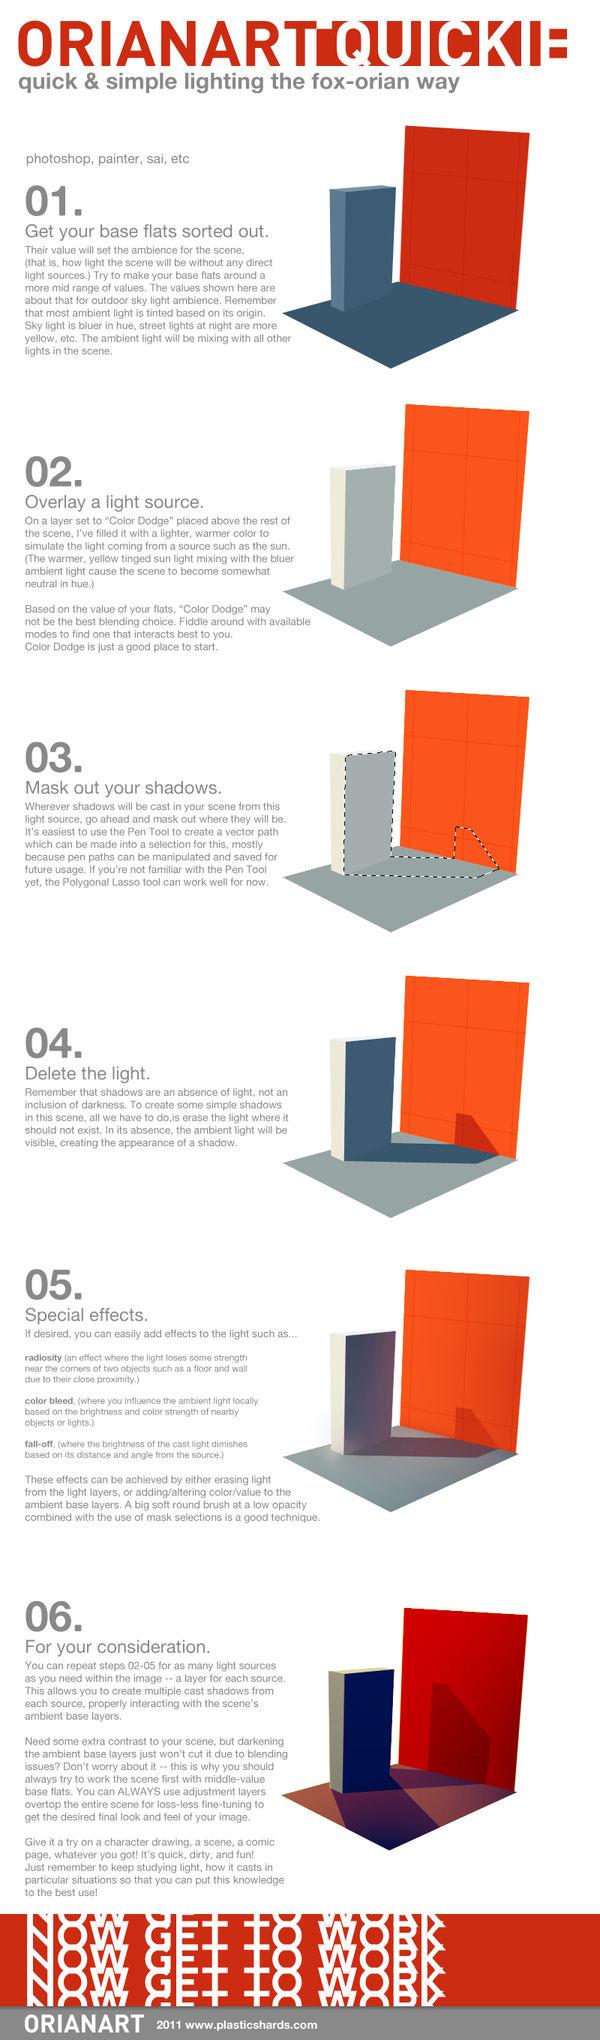 Quick Lighting, Fox's Way by fox-orian